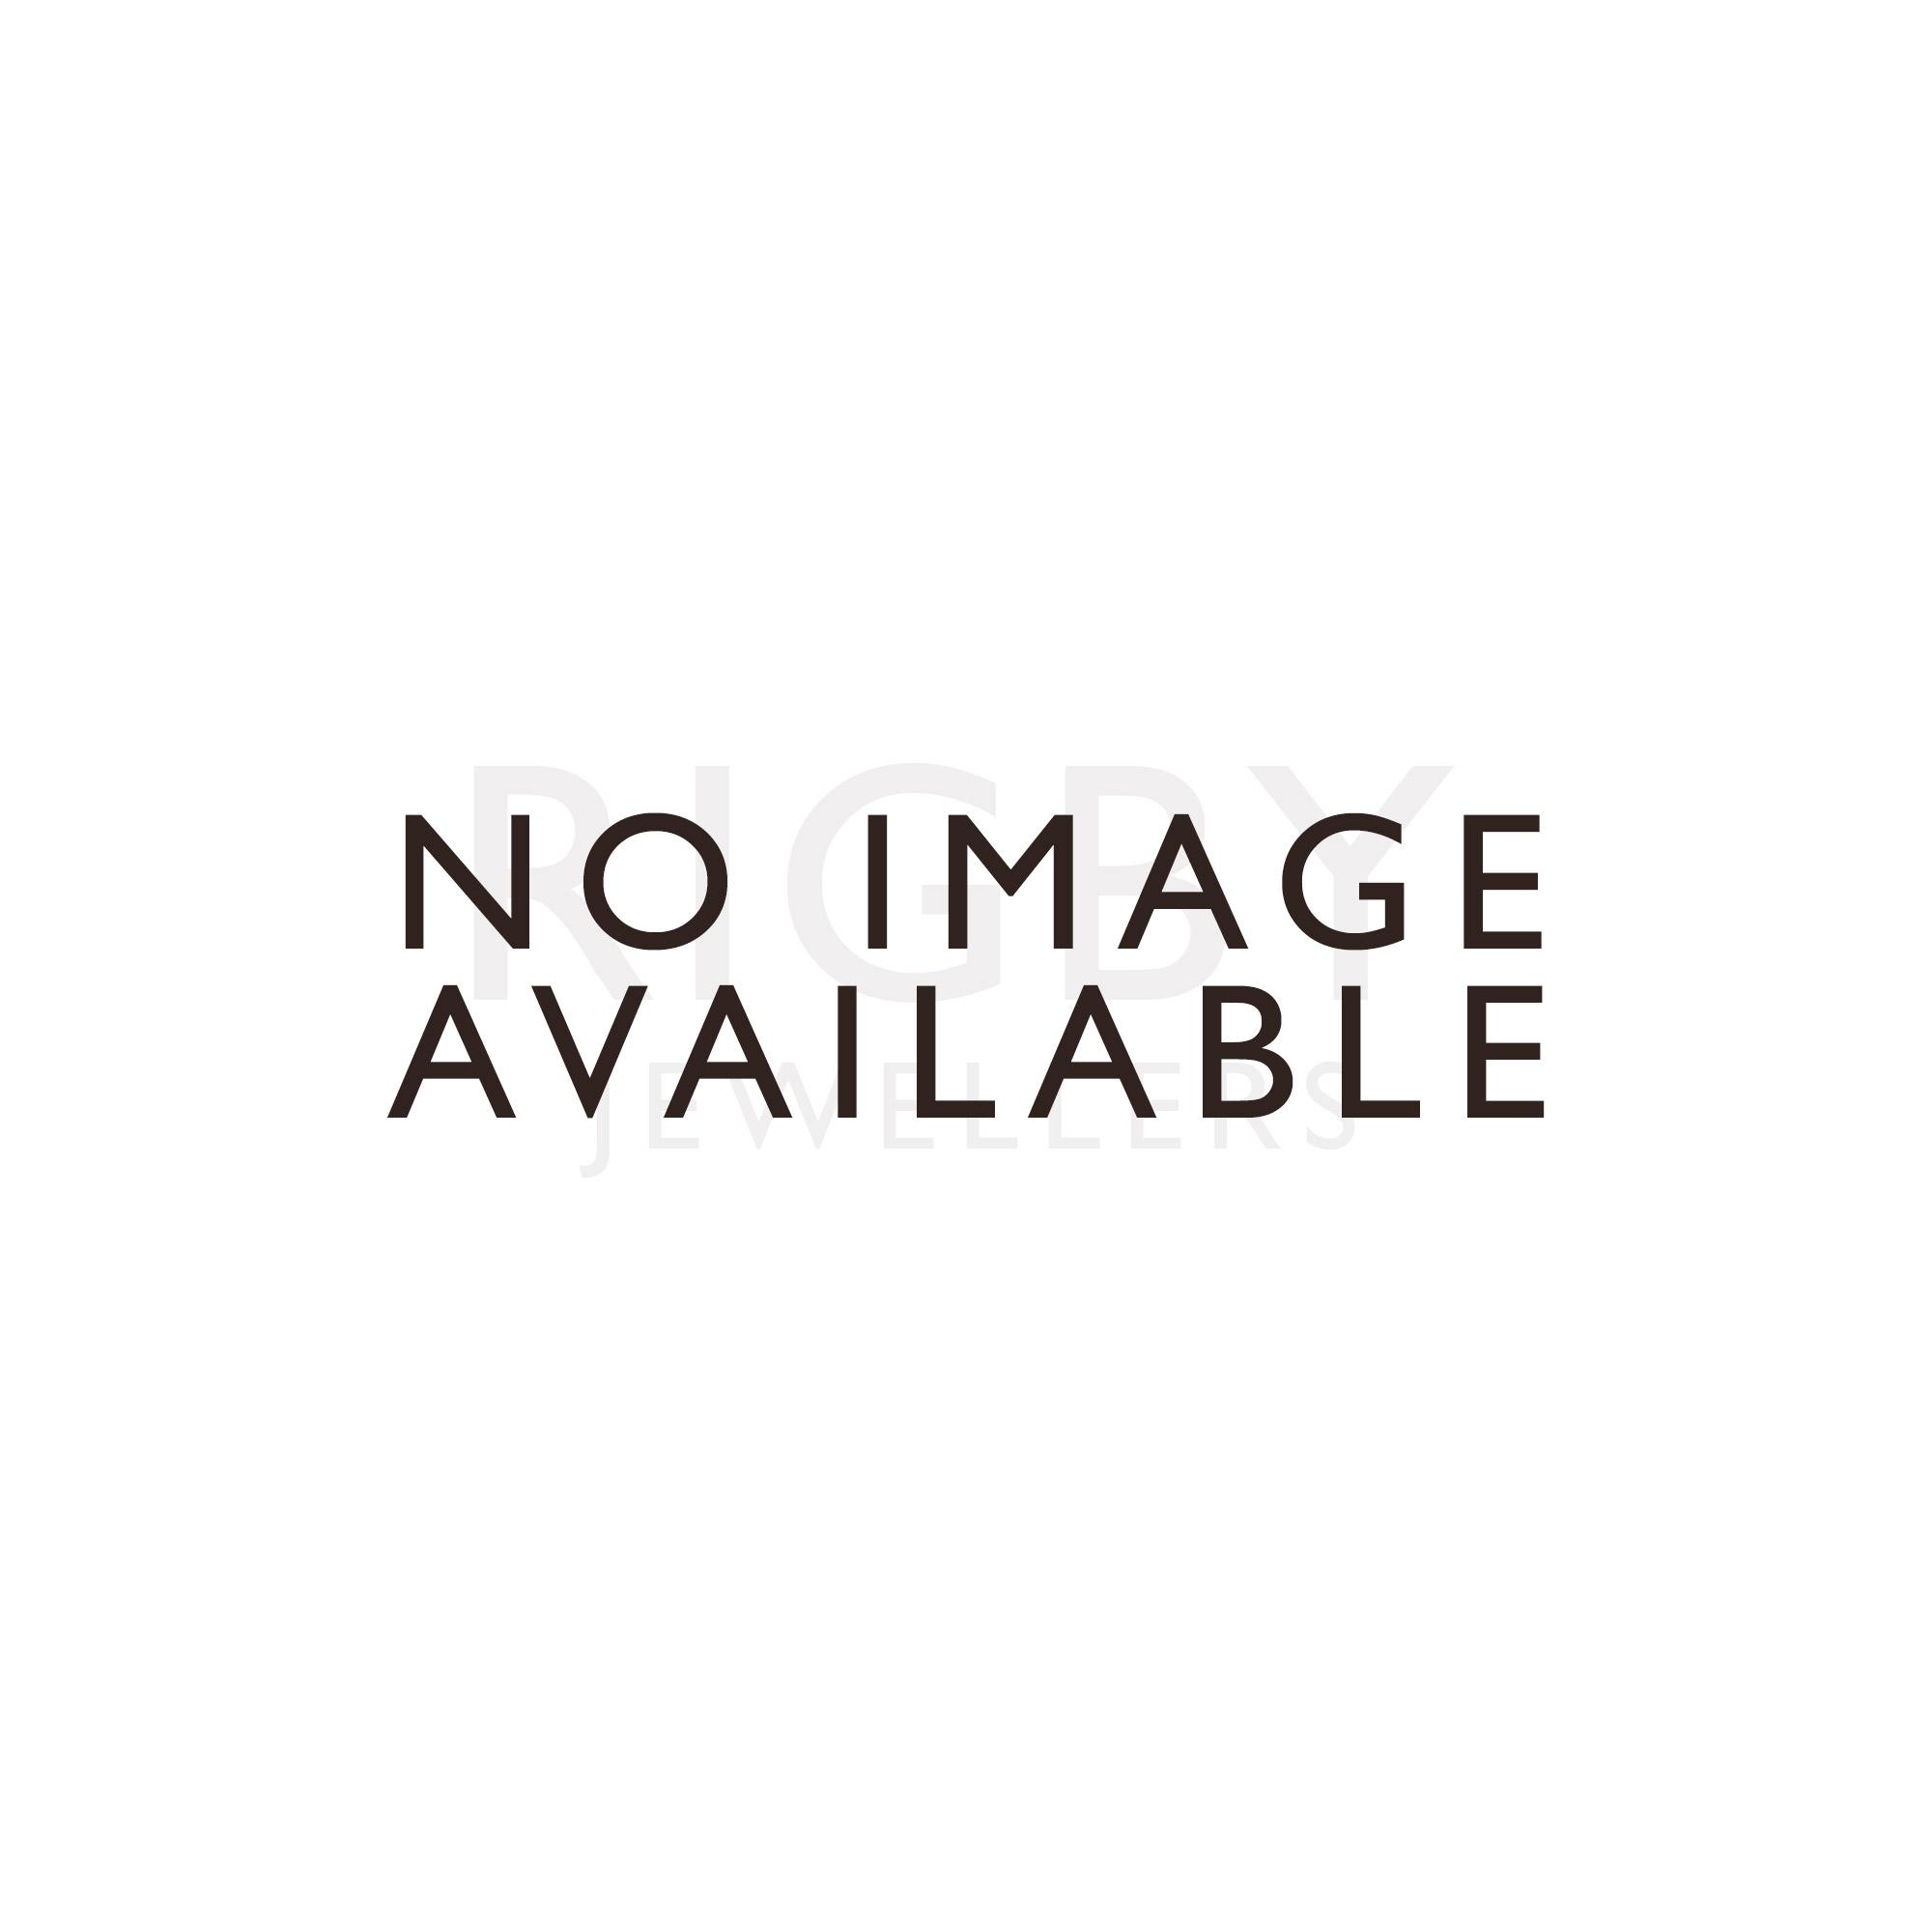 Hexagonal seiko quartz wall clock qxa529b for Seiko quartz wall clock